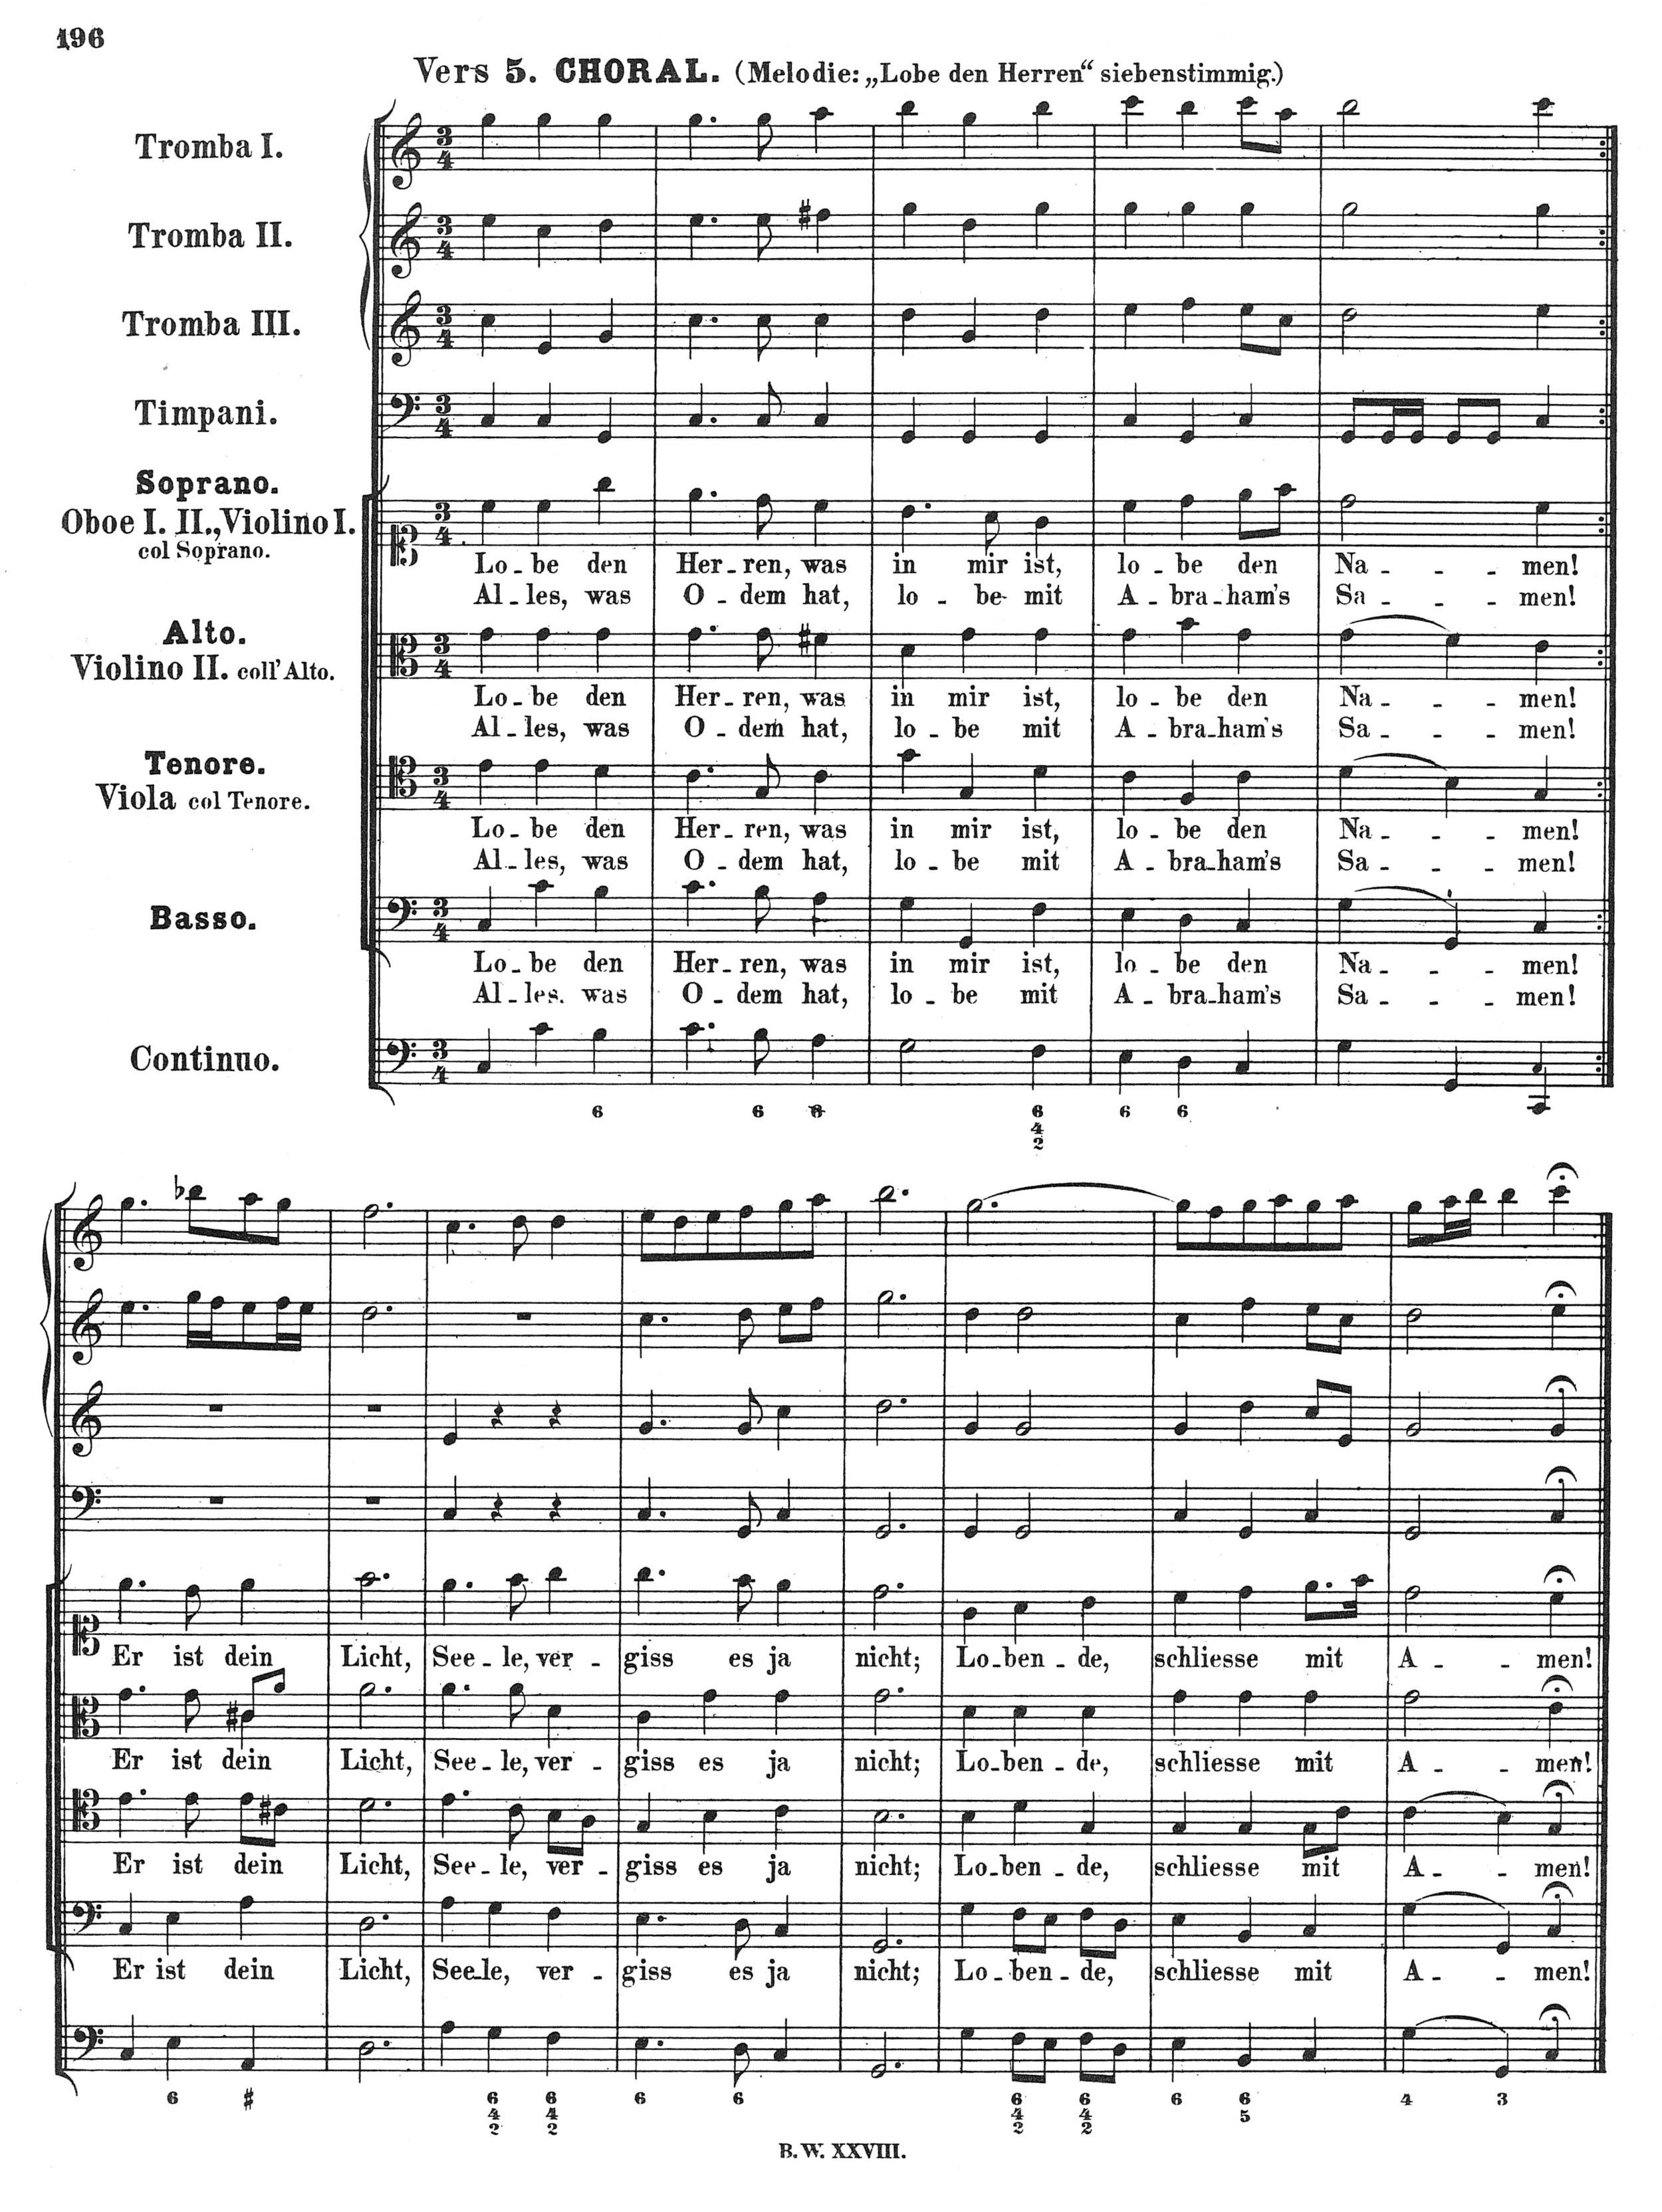 Fig. 5.  Johann Sebastian Bach, Cantata BWV 137 (1725), in  Werke , vol. 28 (Leipzig: Breitkopf & Härtel, 1881).